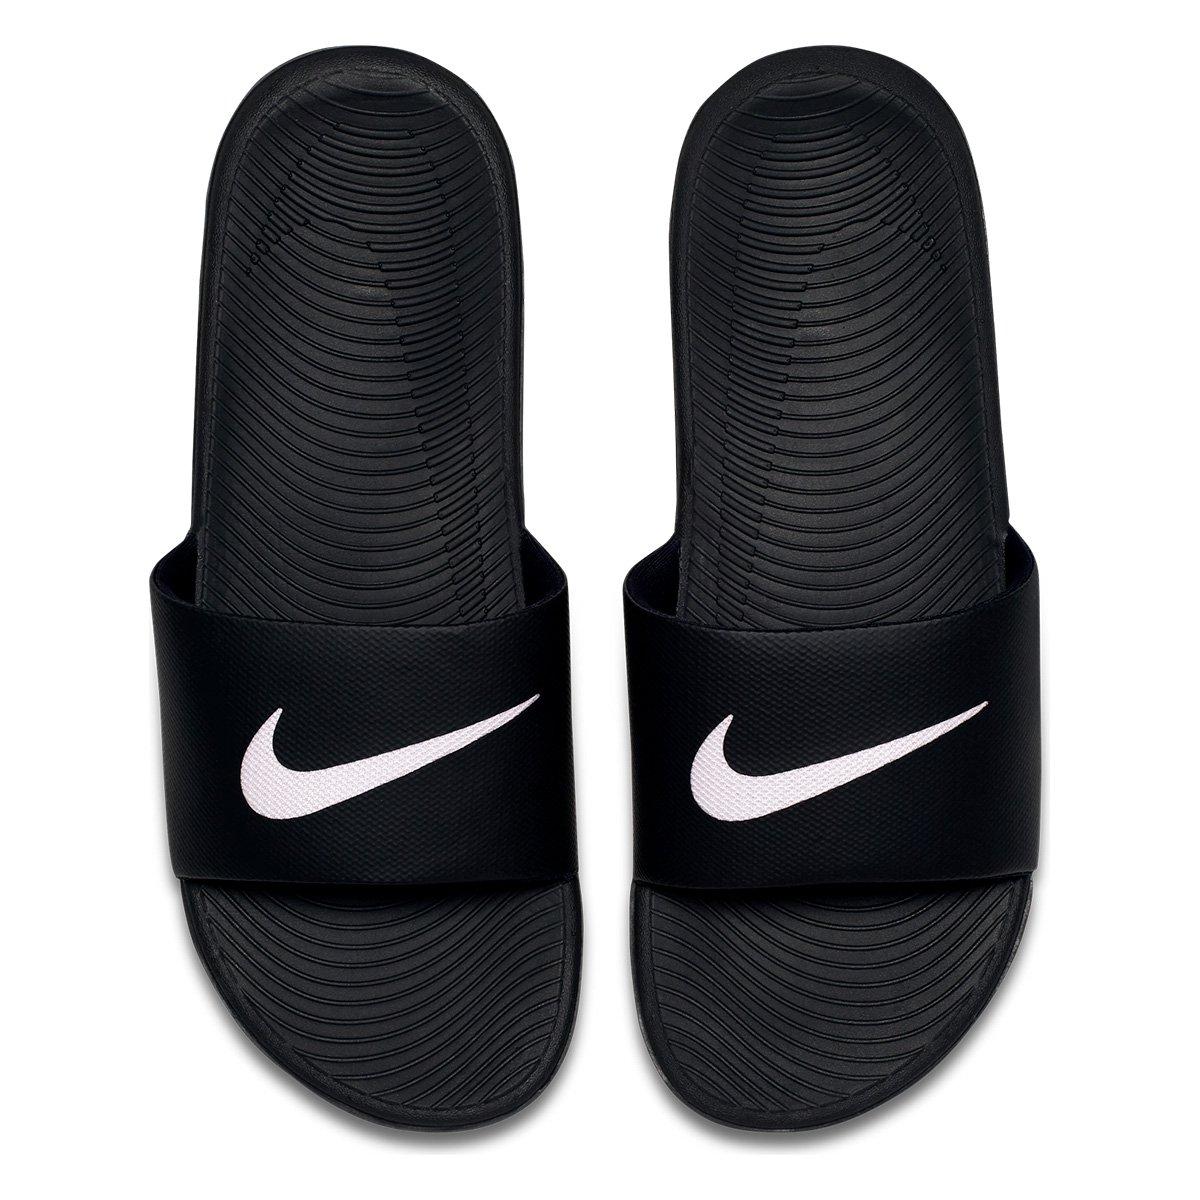 83c6b2c4350 Sandália Nike Kawa Slide Masculina - Preto e Branco - Compre Agora ...